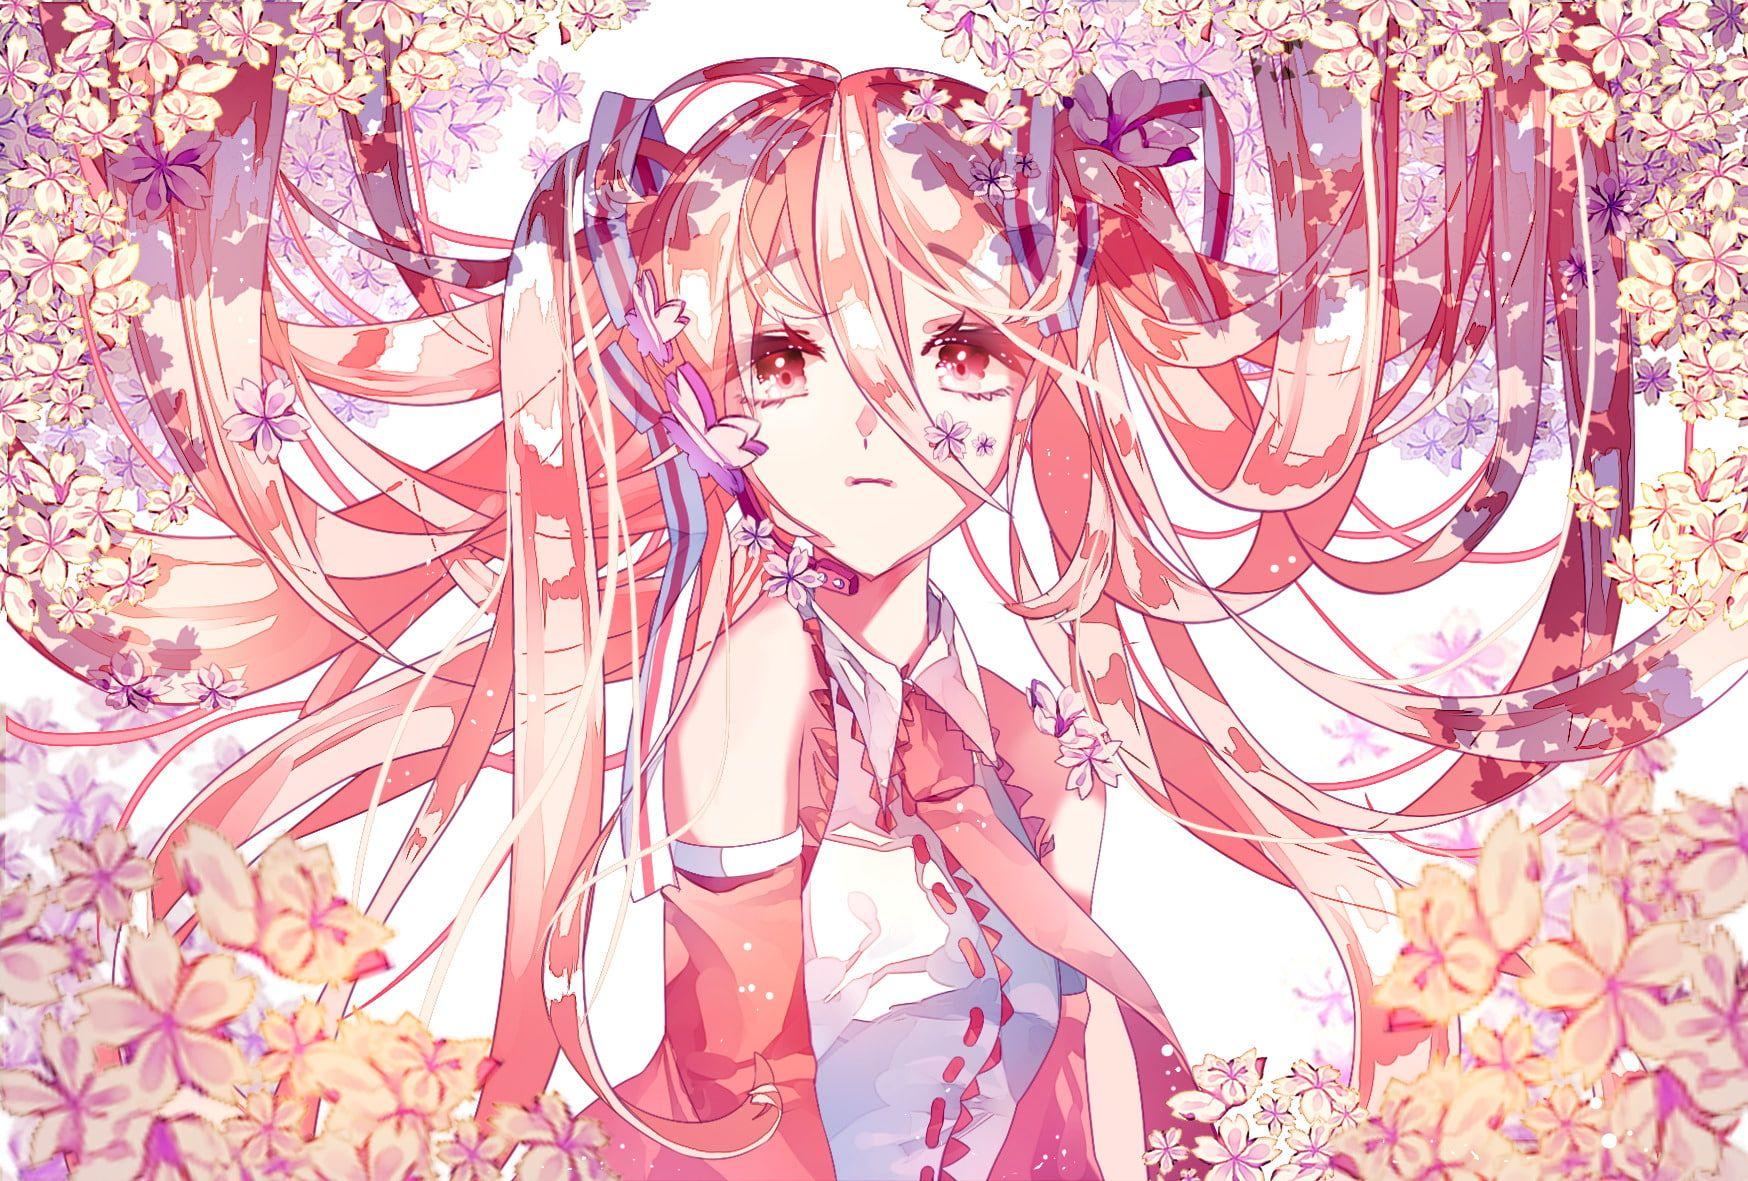 Anime Vocaloid Sakura Miku 720p Wallpaper Hdwallpaper Desktop Hatsune Miku Miku Anime Anime vocaloid wallpaper hd